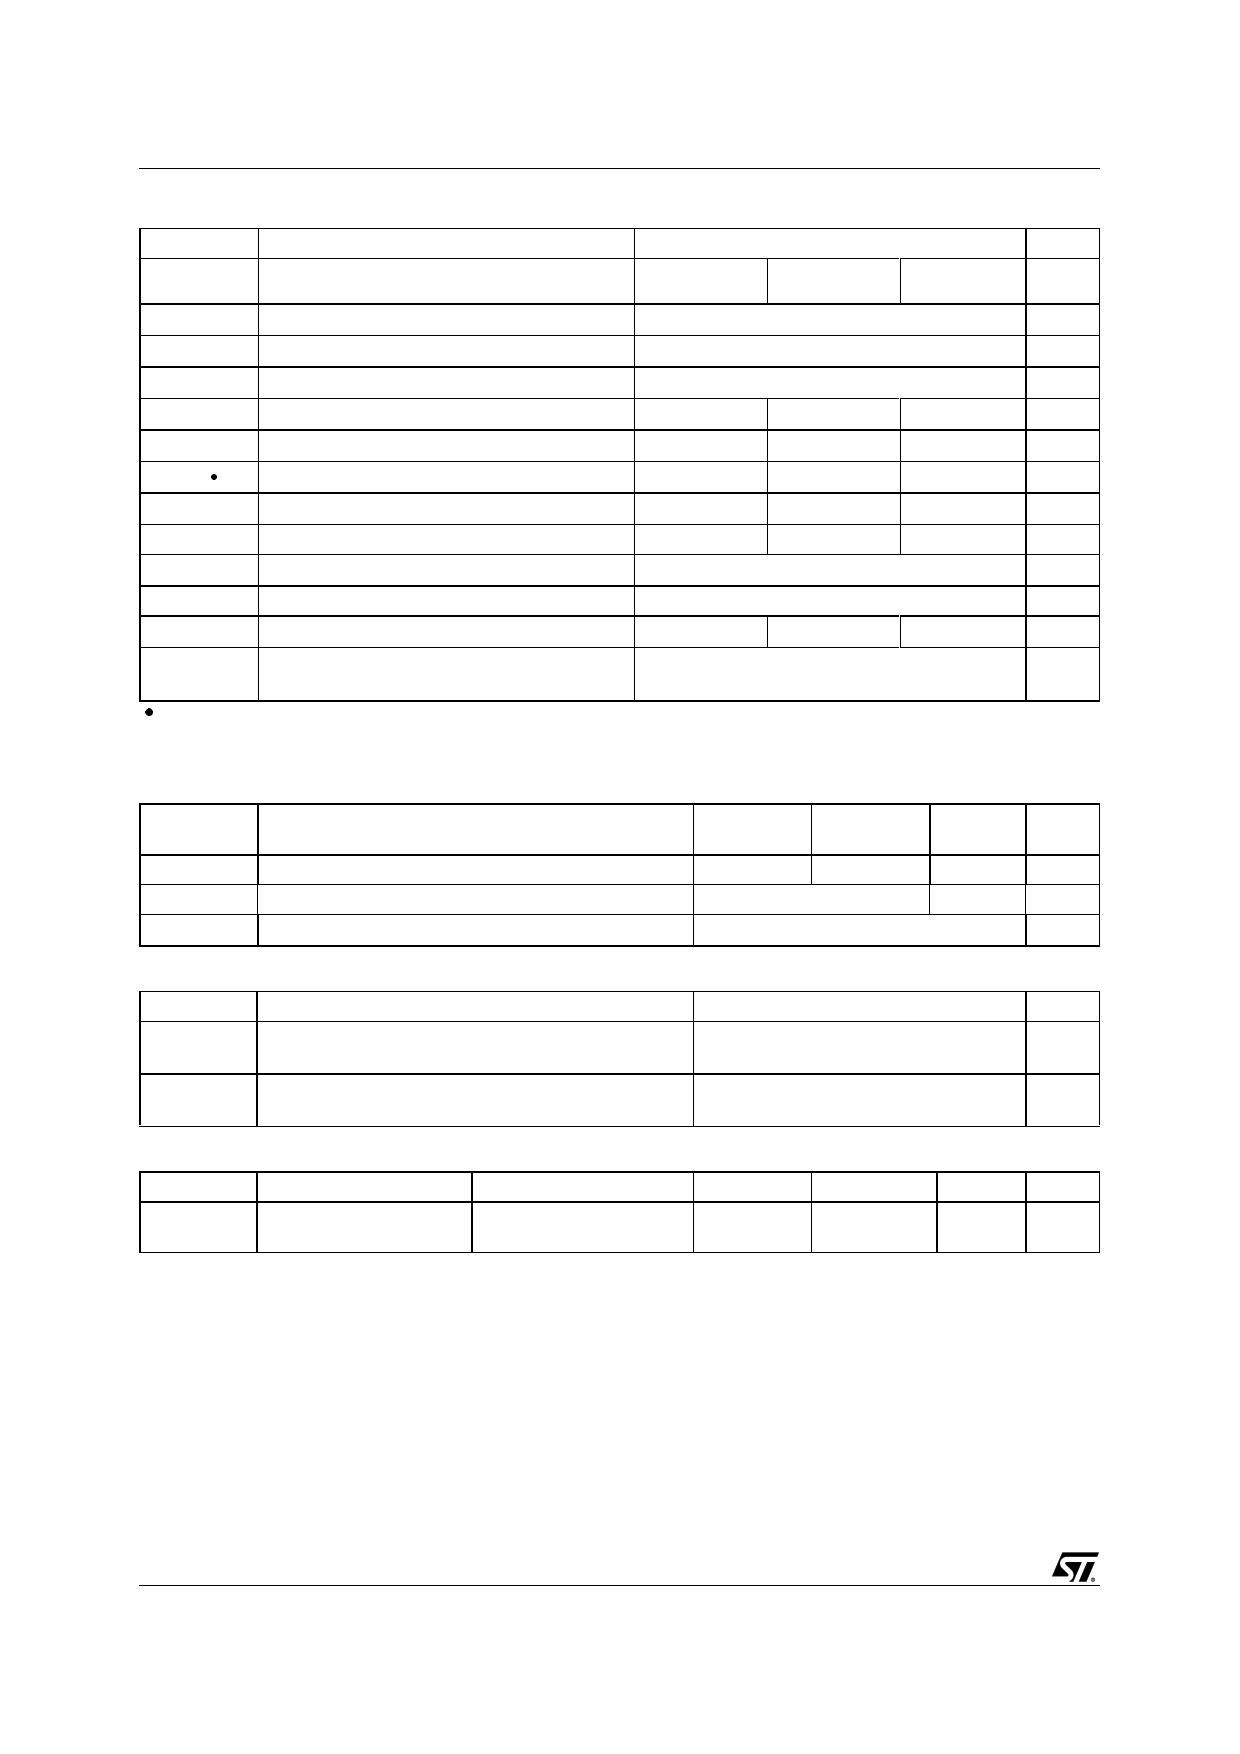 P3NK80Z pdf, schematic